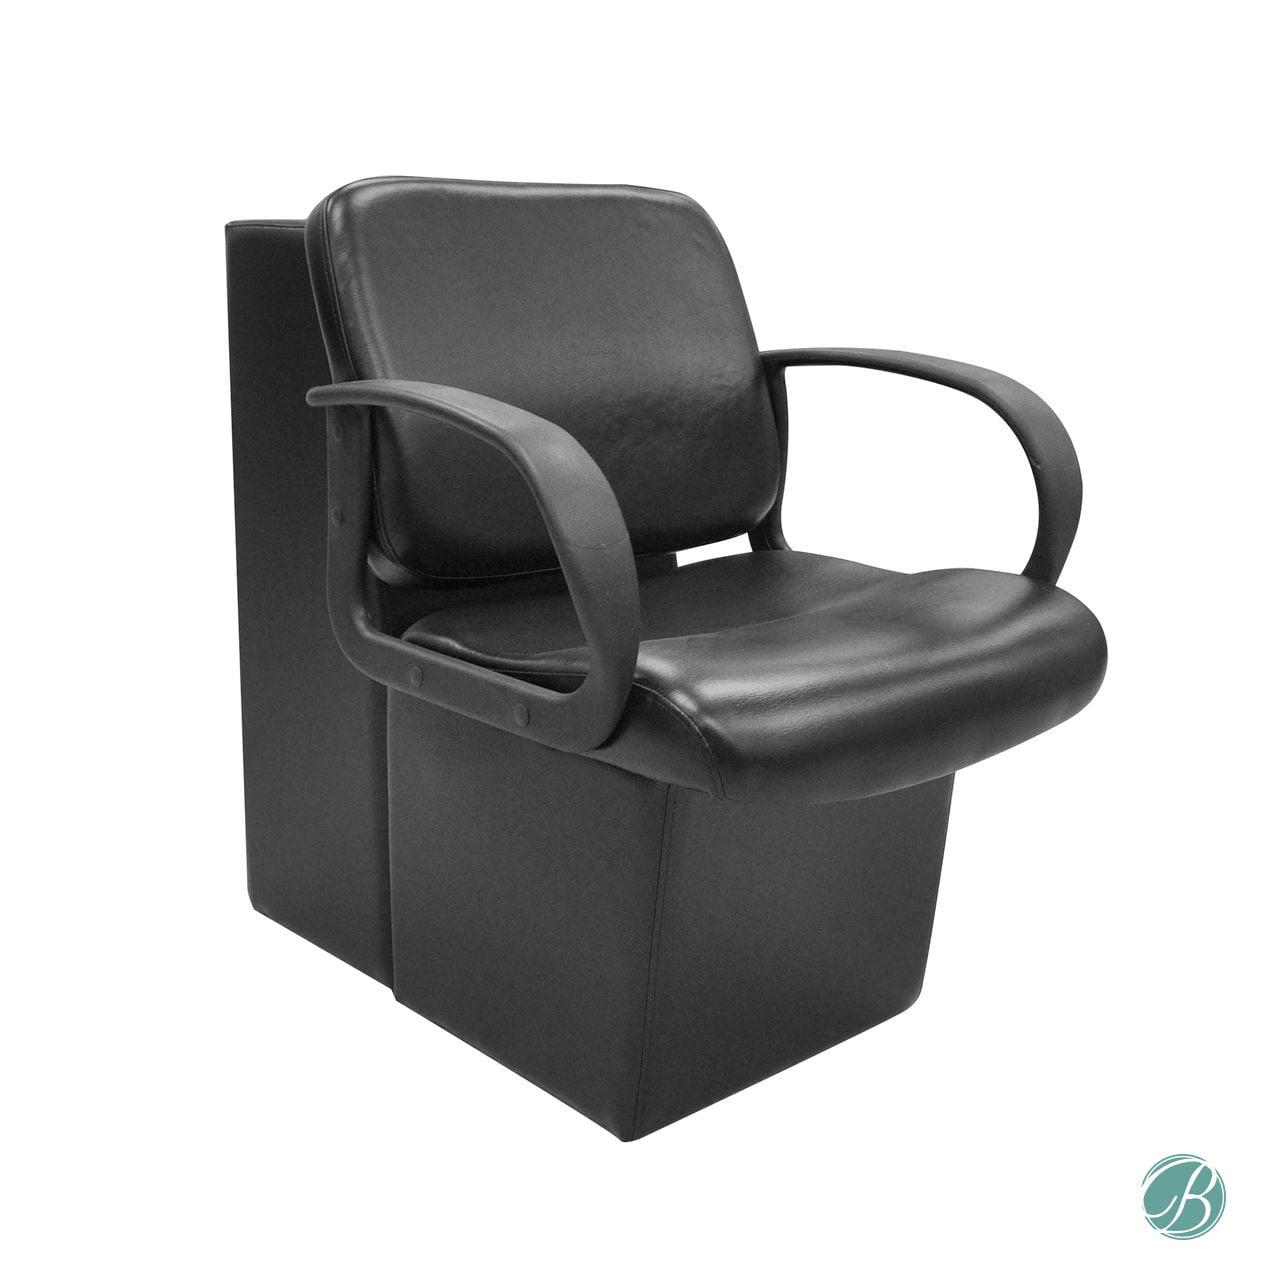 Berkeley Systems HAMILTON Hair Dryer Chair Kit